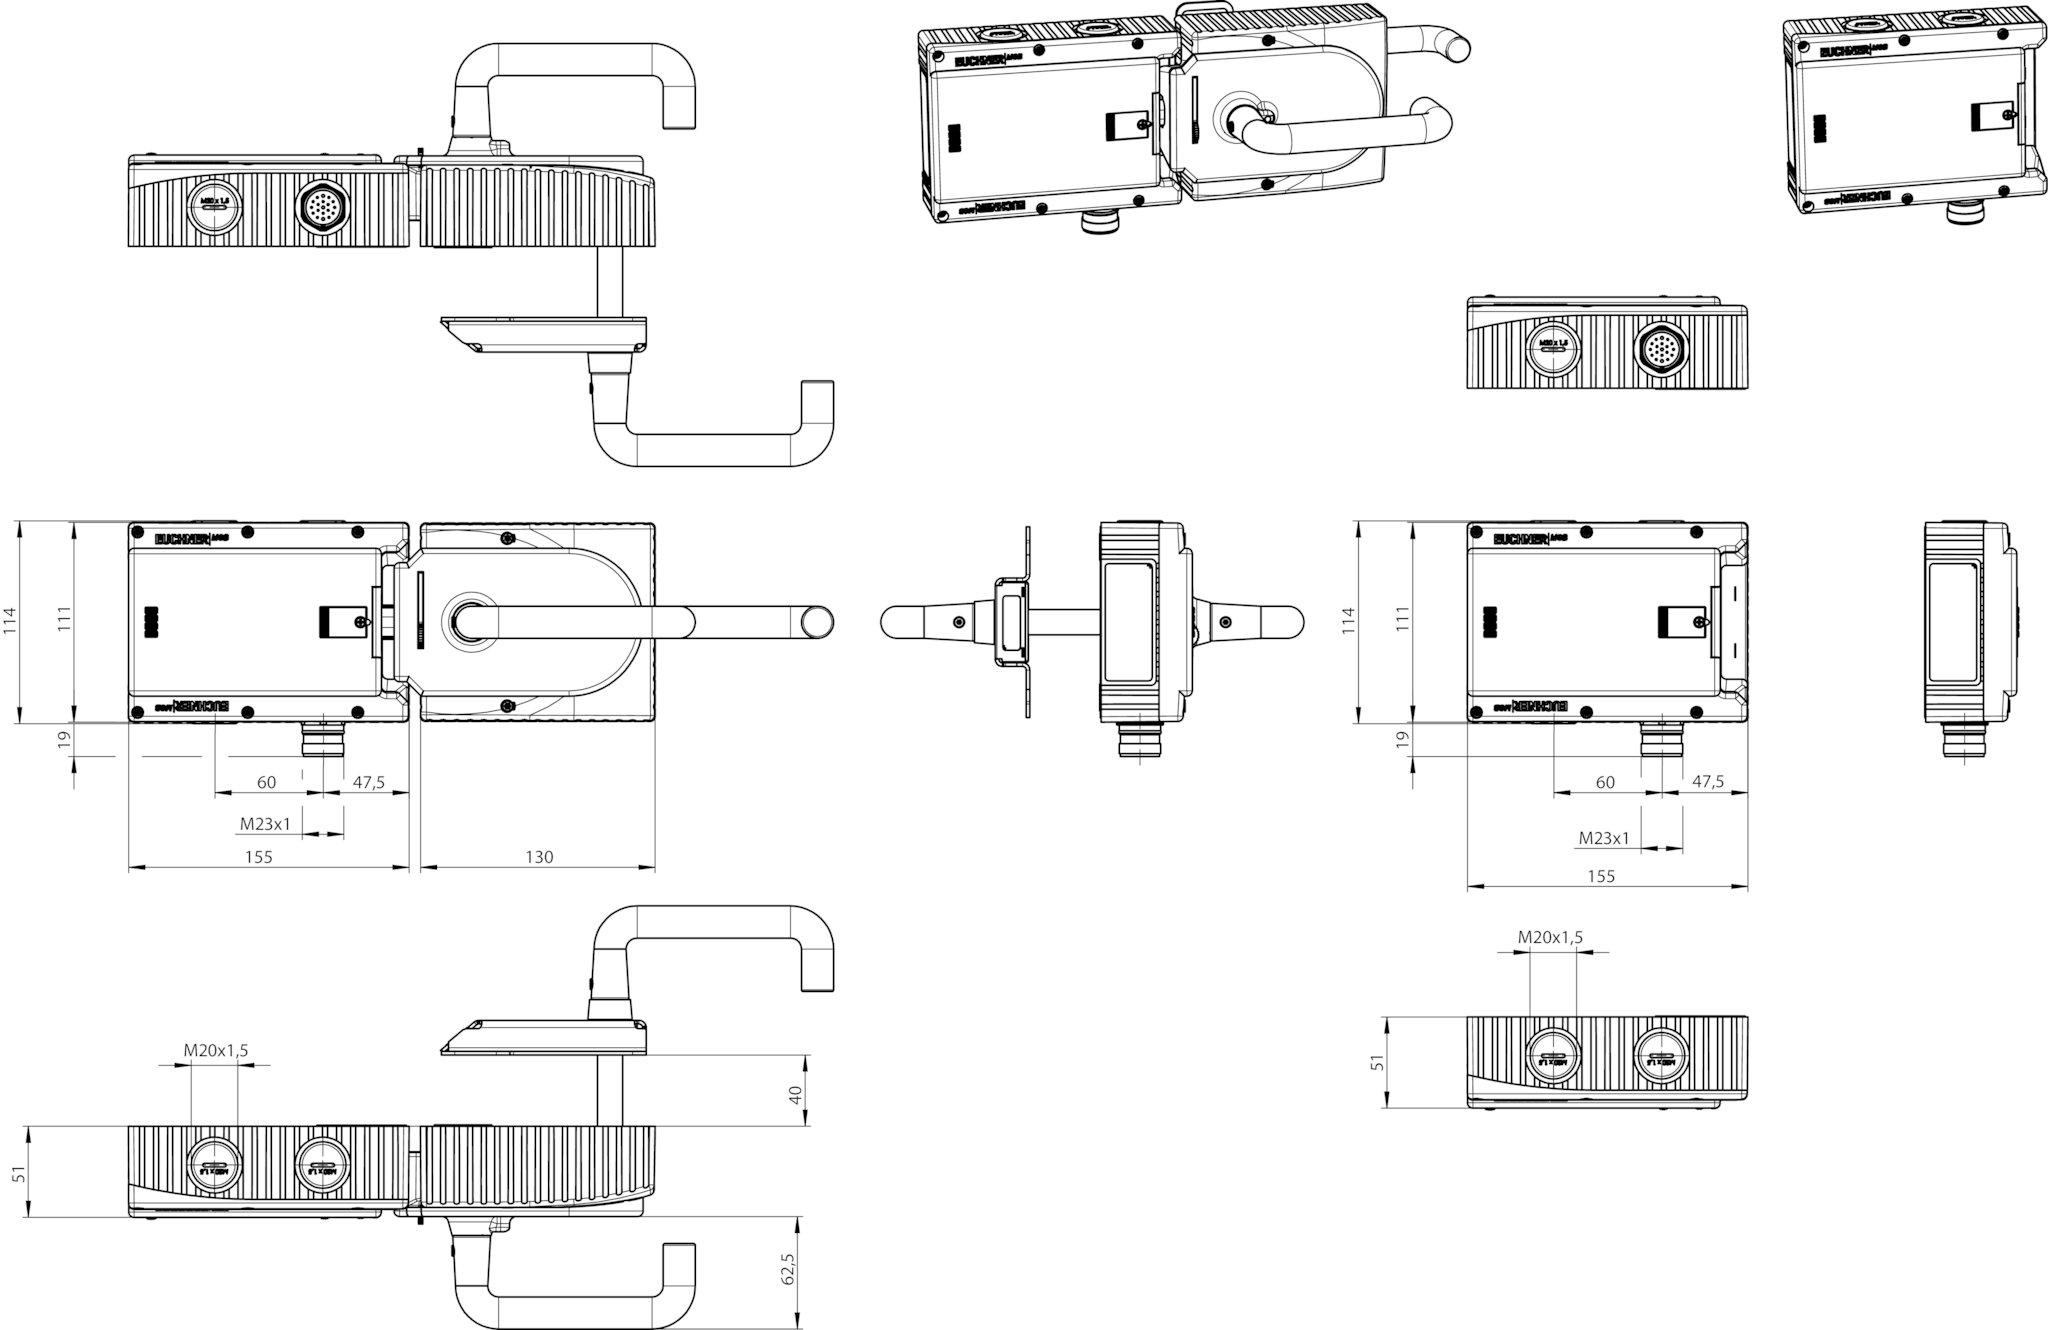 Mgb L0he Apa R 112600 Euchner More Than Safety